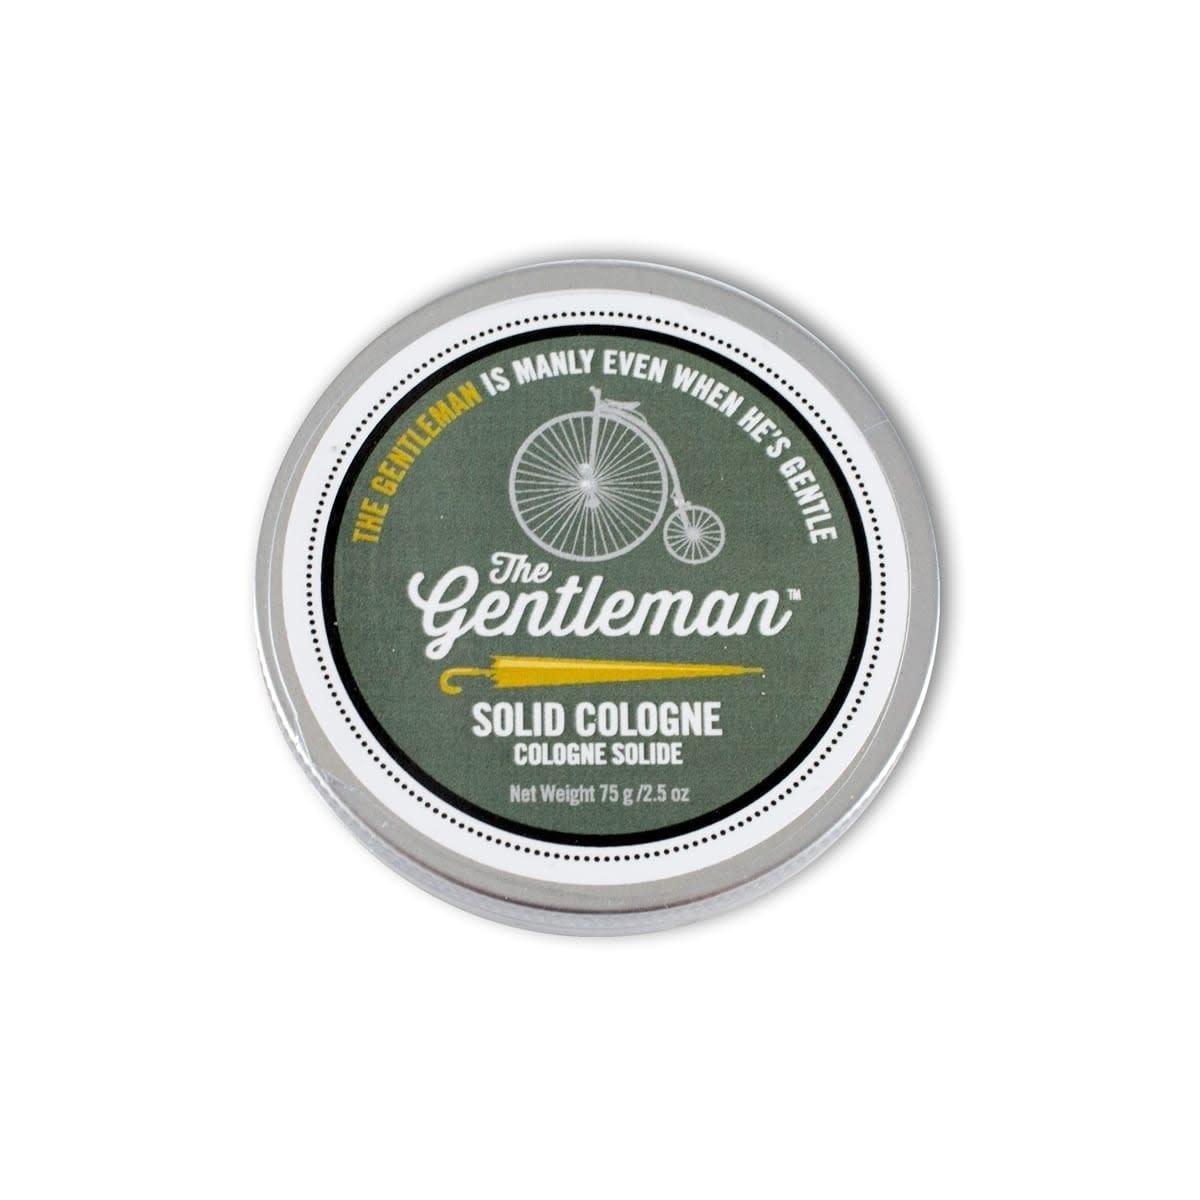 Walton Wood Farm Solid Cologne - The Gentleman 2.5oz